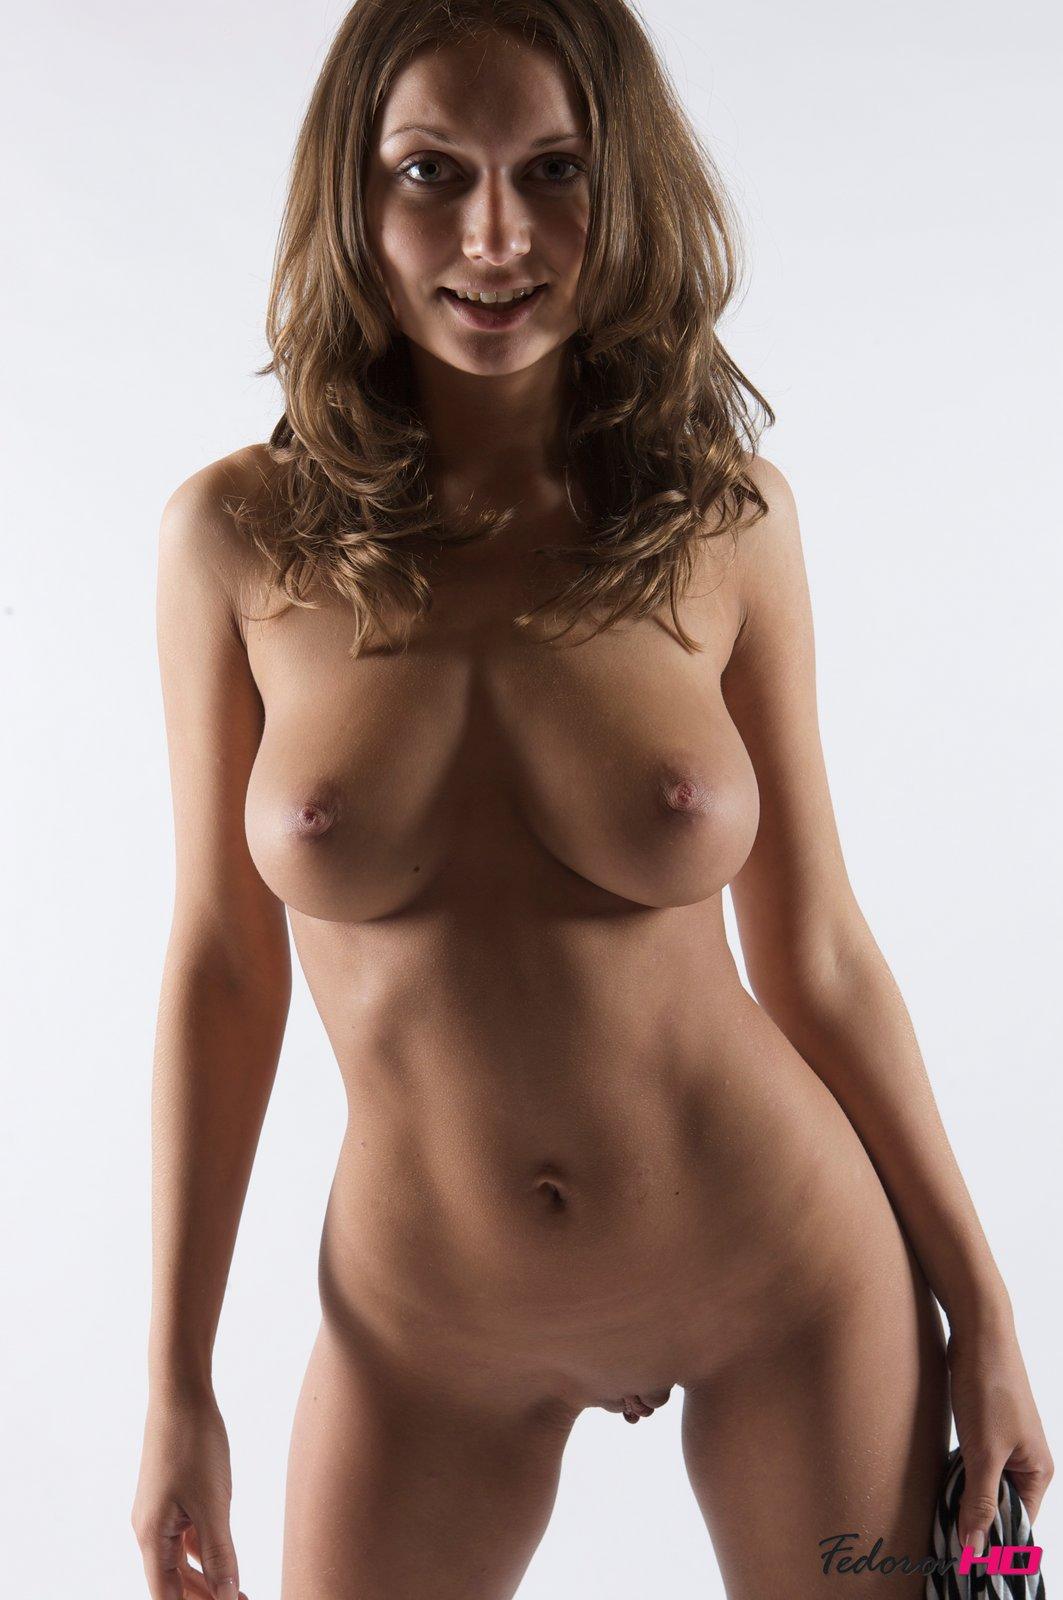 Алла маур порно секс видео